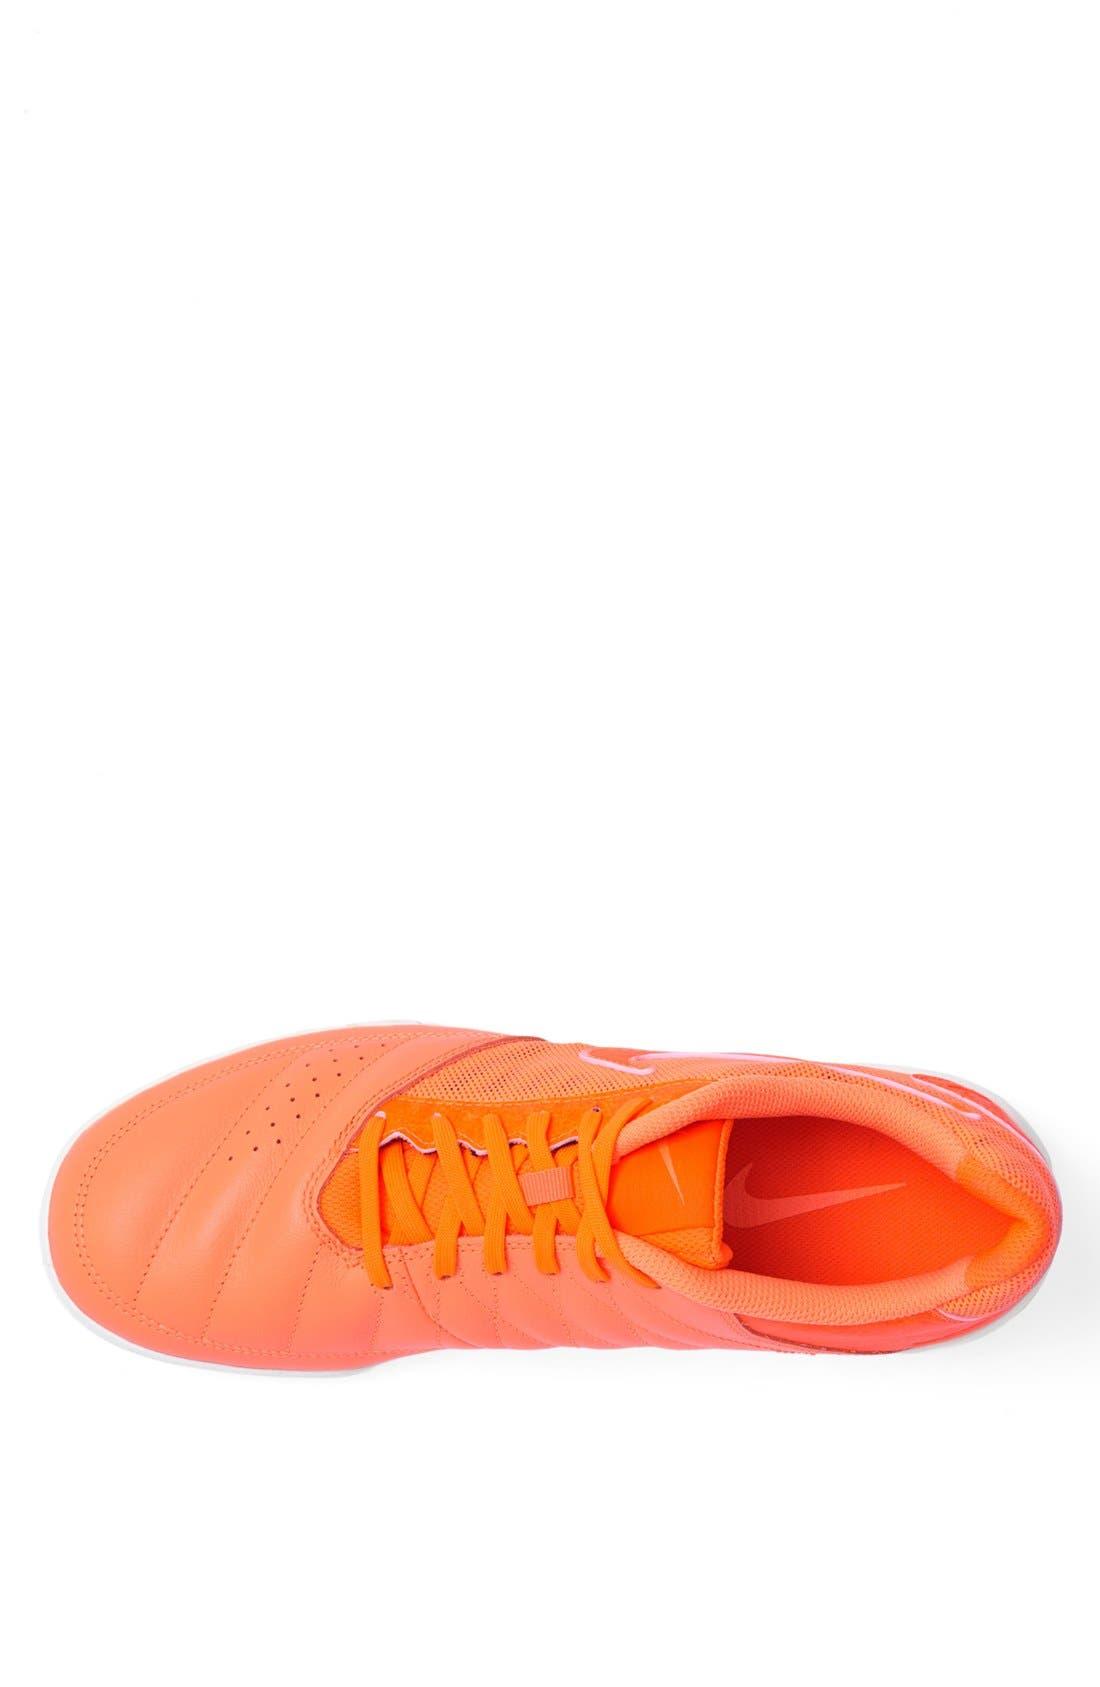 Alternate Image 3  - Nike 'Gato II' Soccer Shoe (Men)